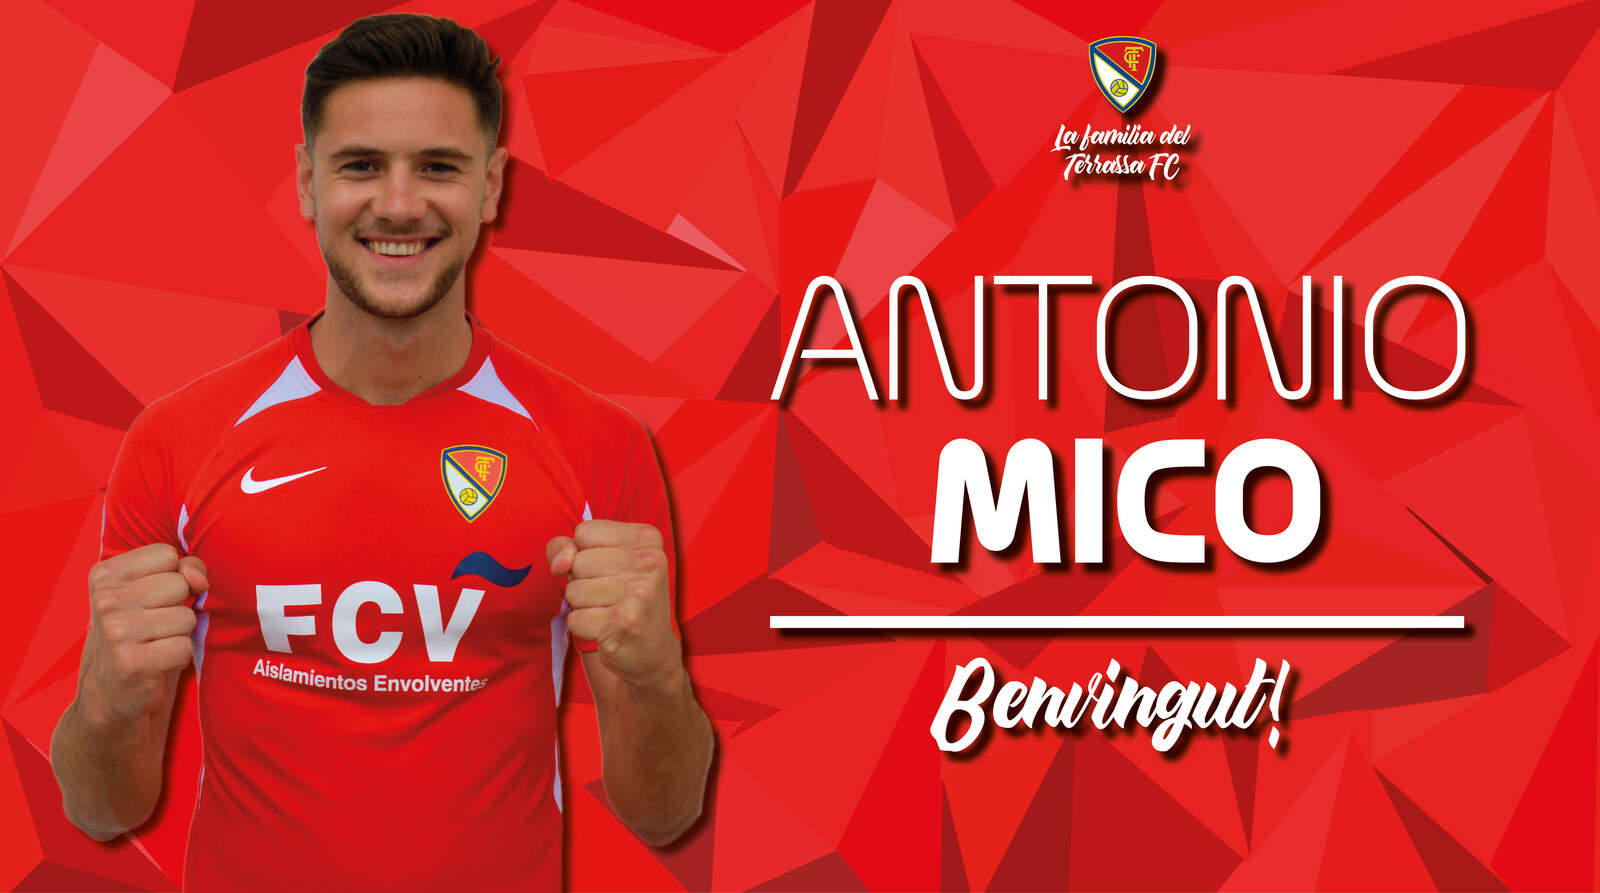 Antonio Mico